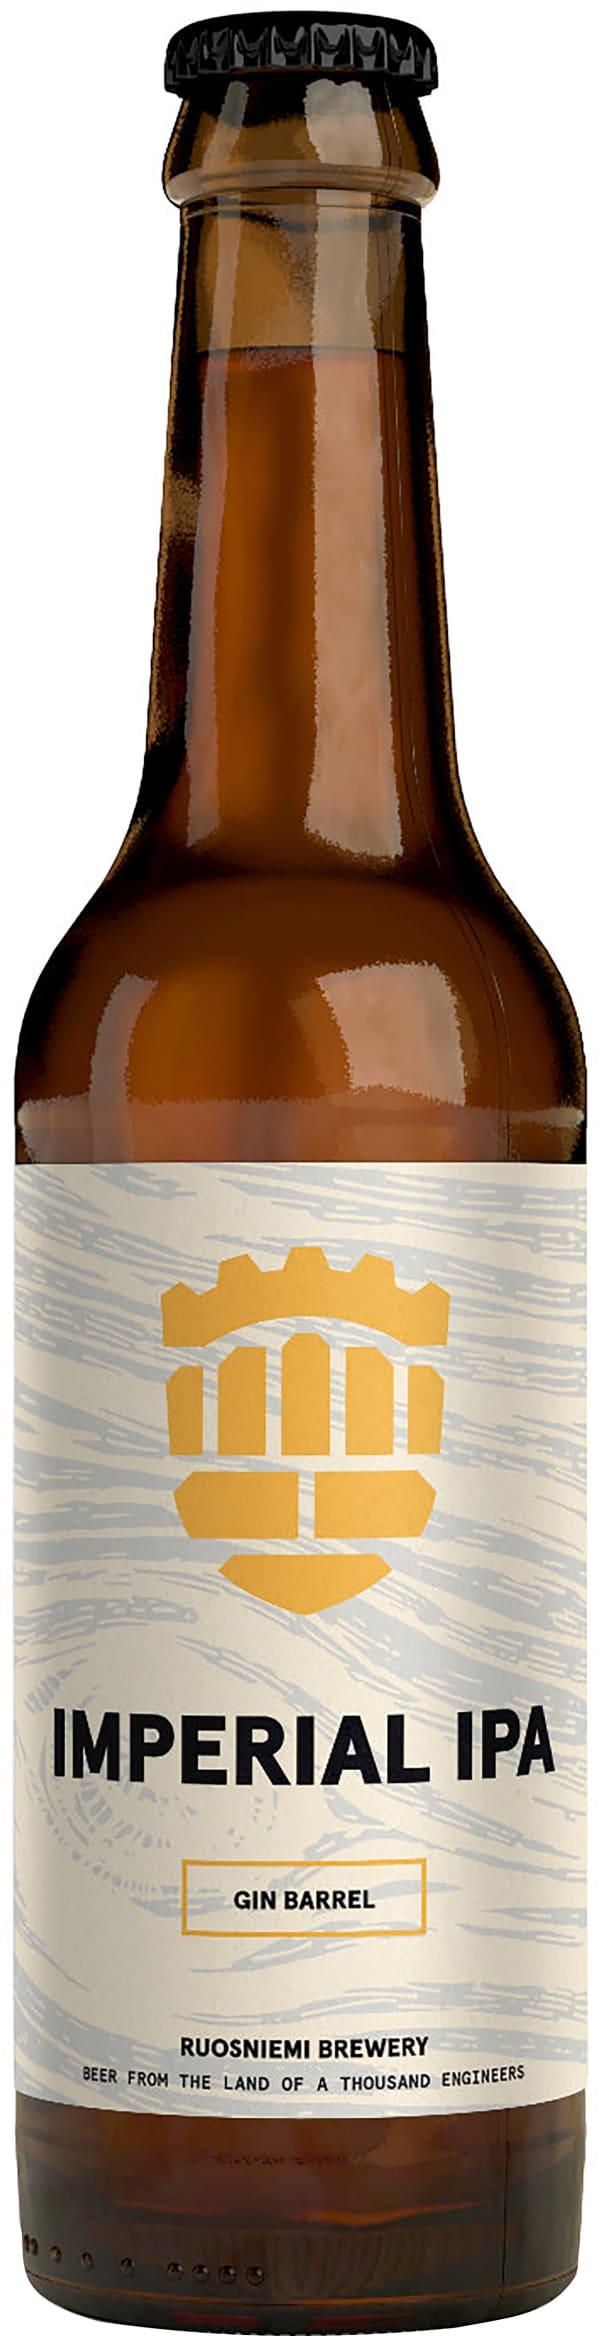 Ruosniemen Gin Barrel Imperial IPA